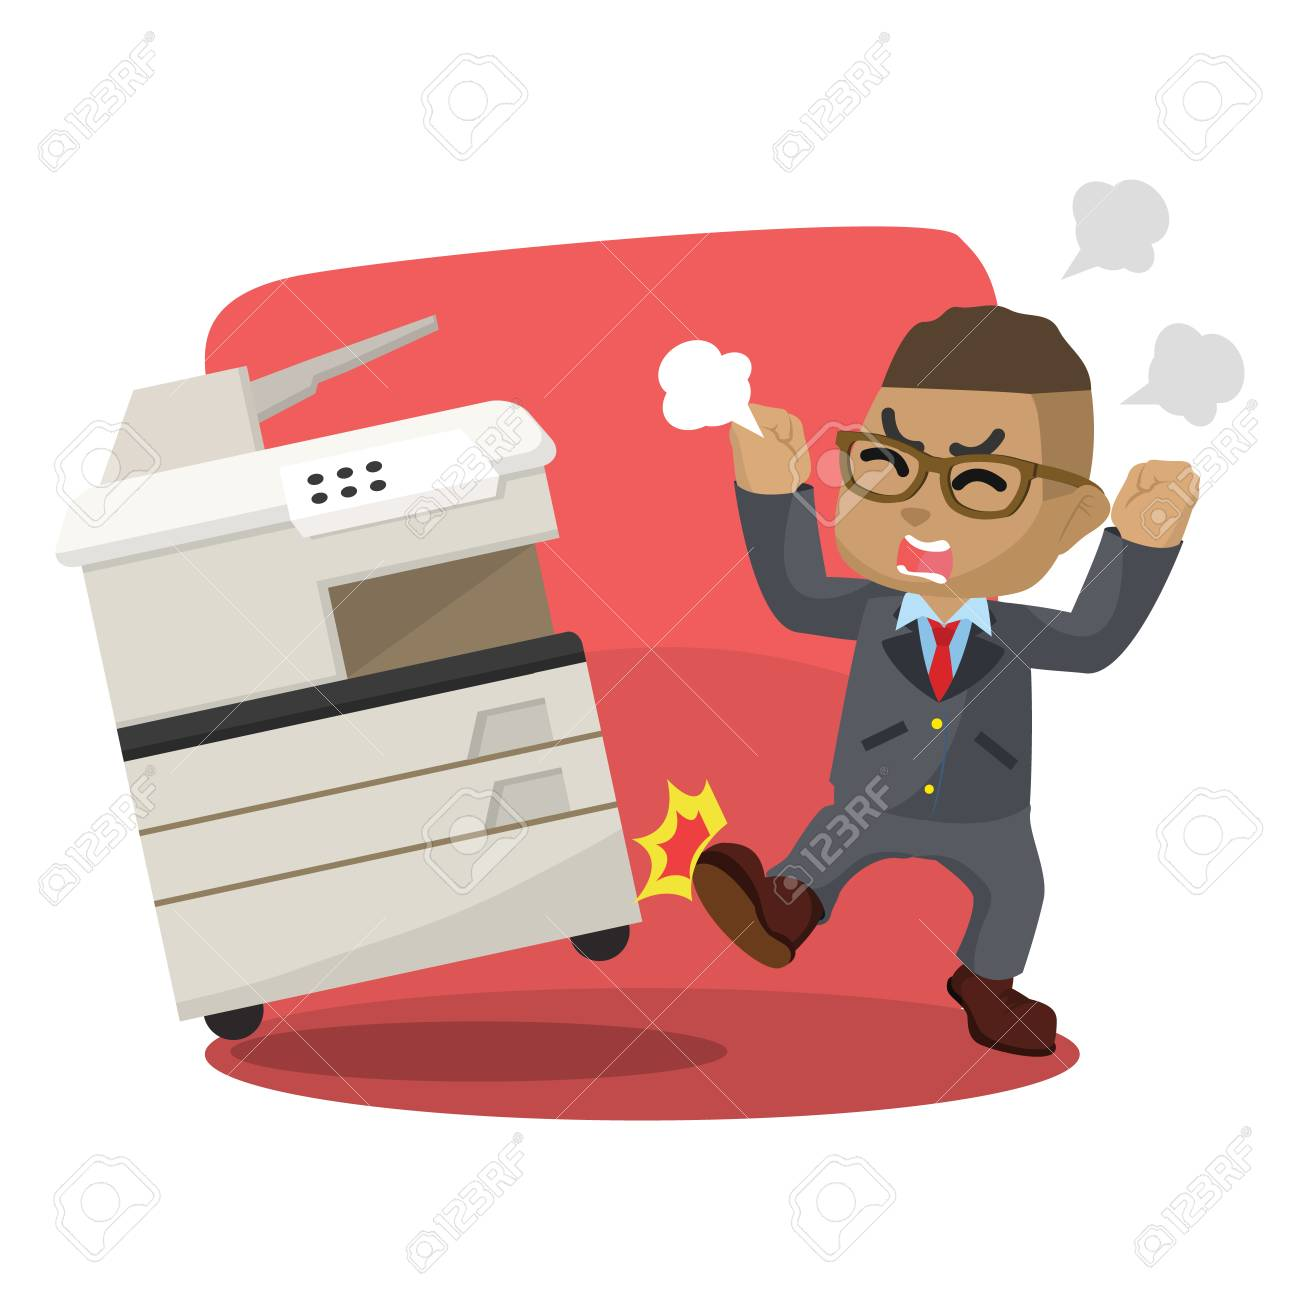 African businessman angry kicking photocopy machine stock illustration. - 92842548